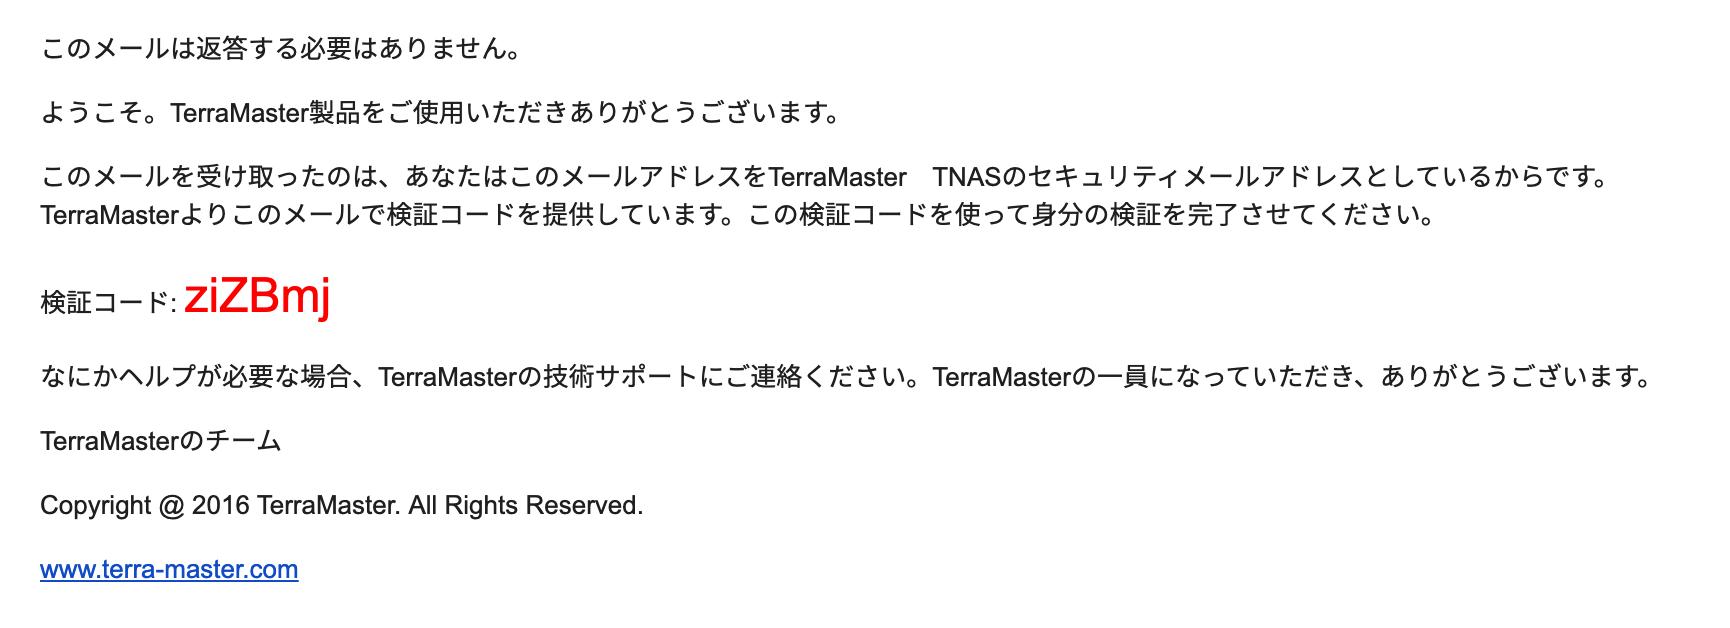 TerraMaster メール認証